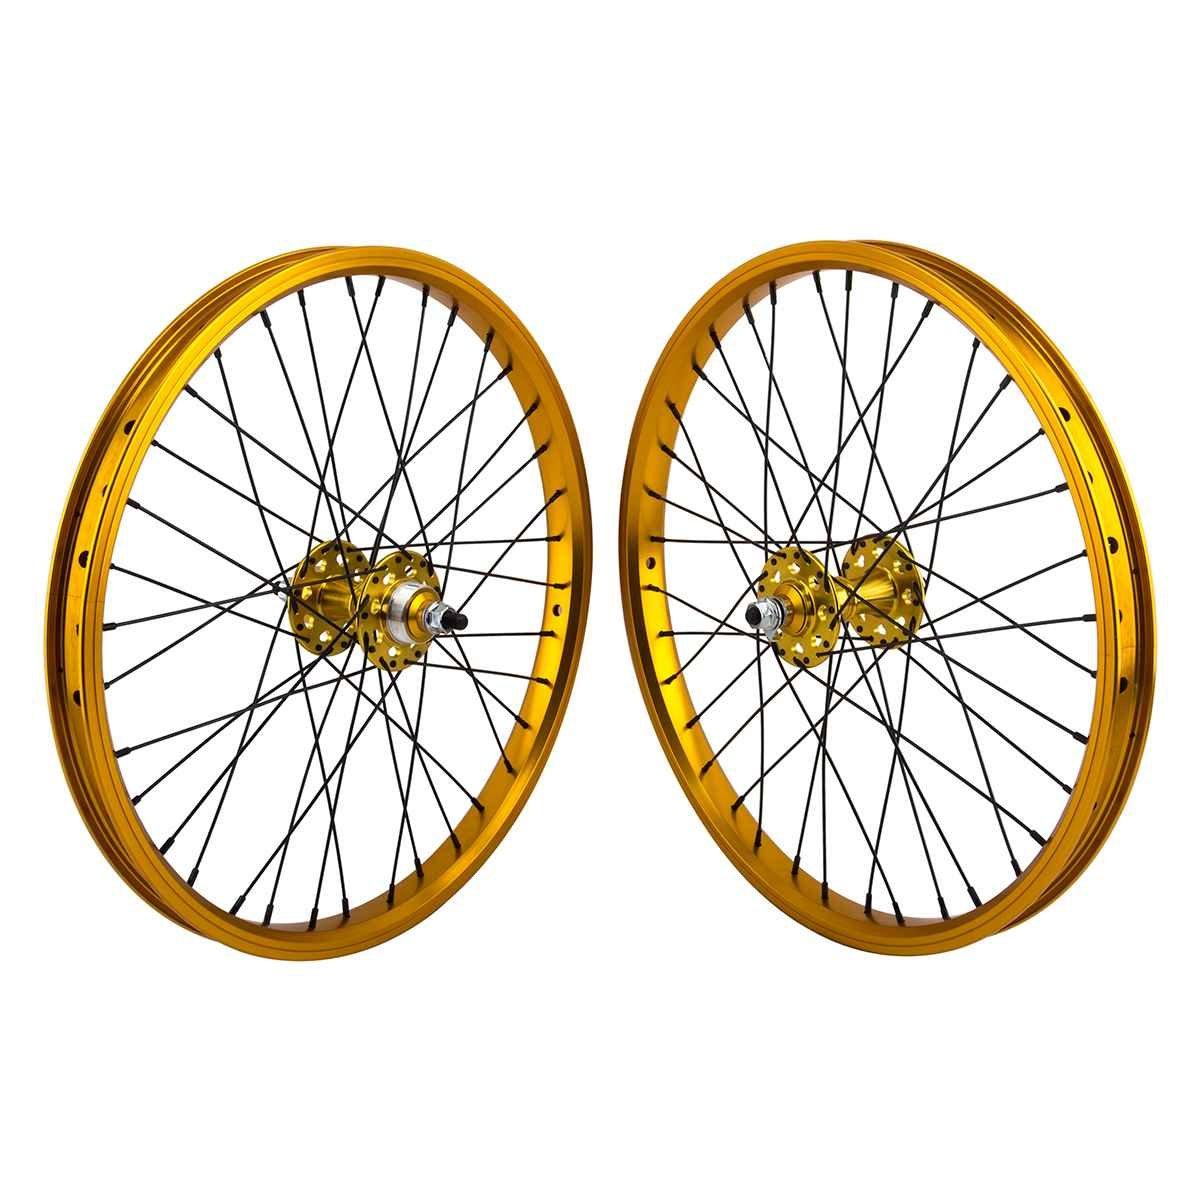 Se Bikes Whl Pr 20 x 1.75 406 x 24 SE Racing GD 36 SE Racing 1s FW Seal 3 / 8 GD 110 mm 14 gBK B076B8ZVXZ